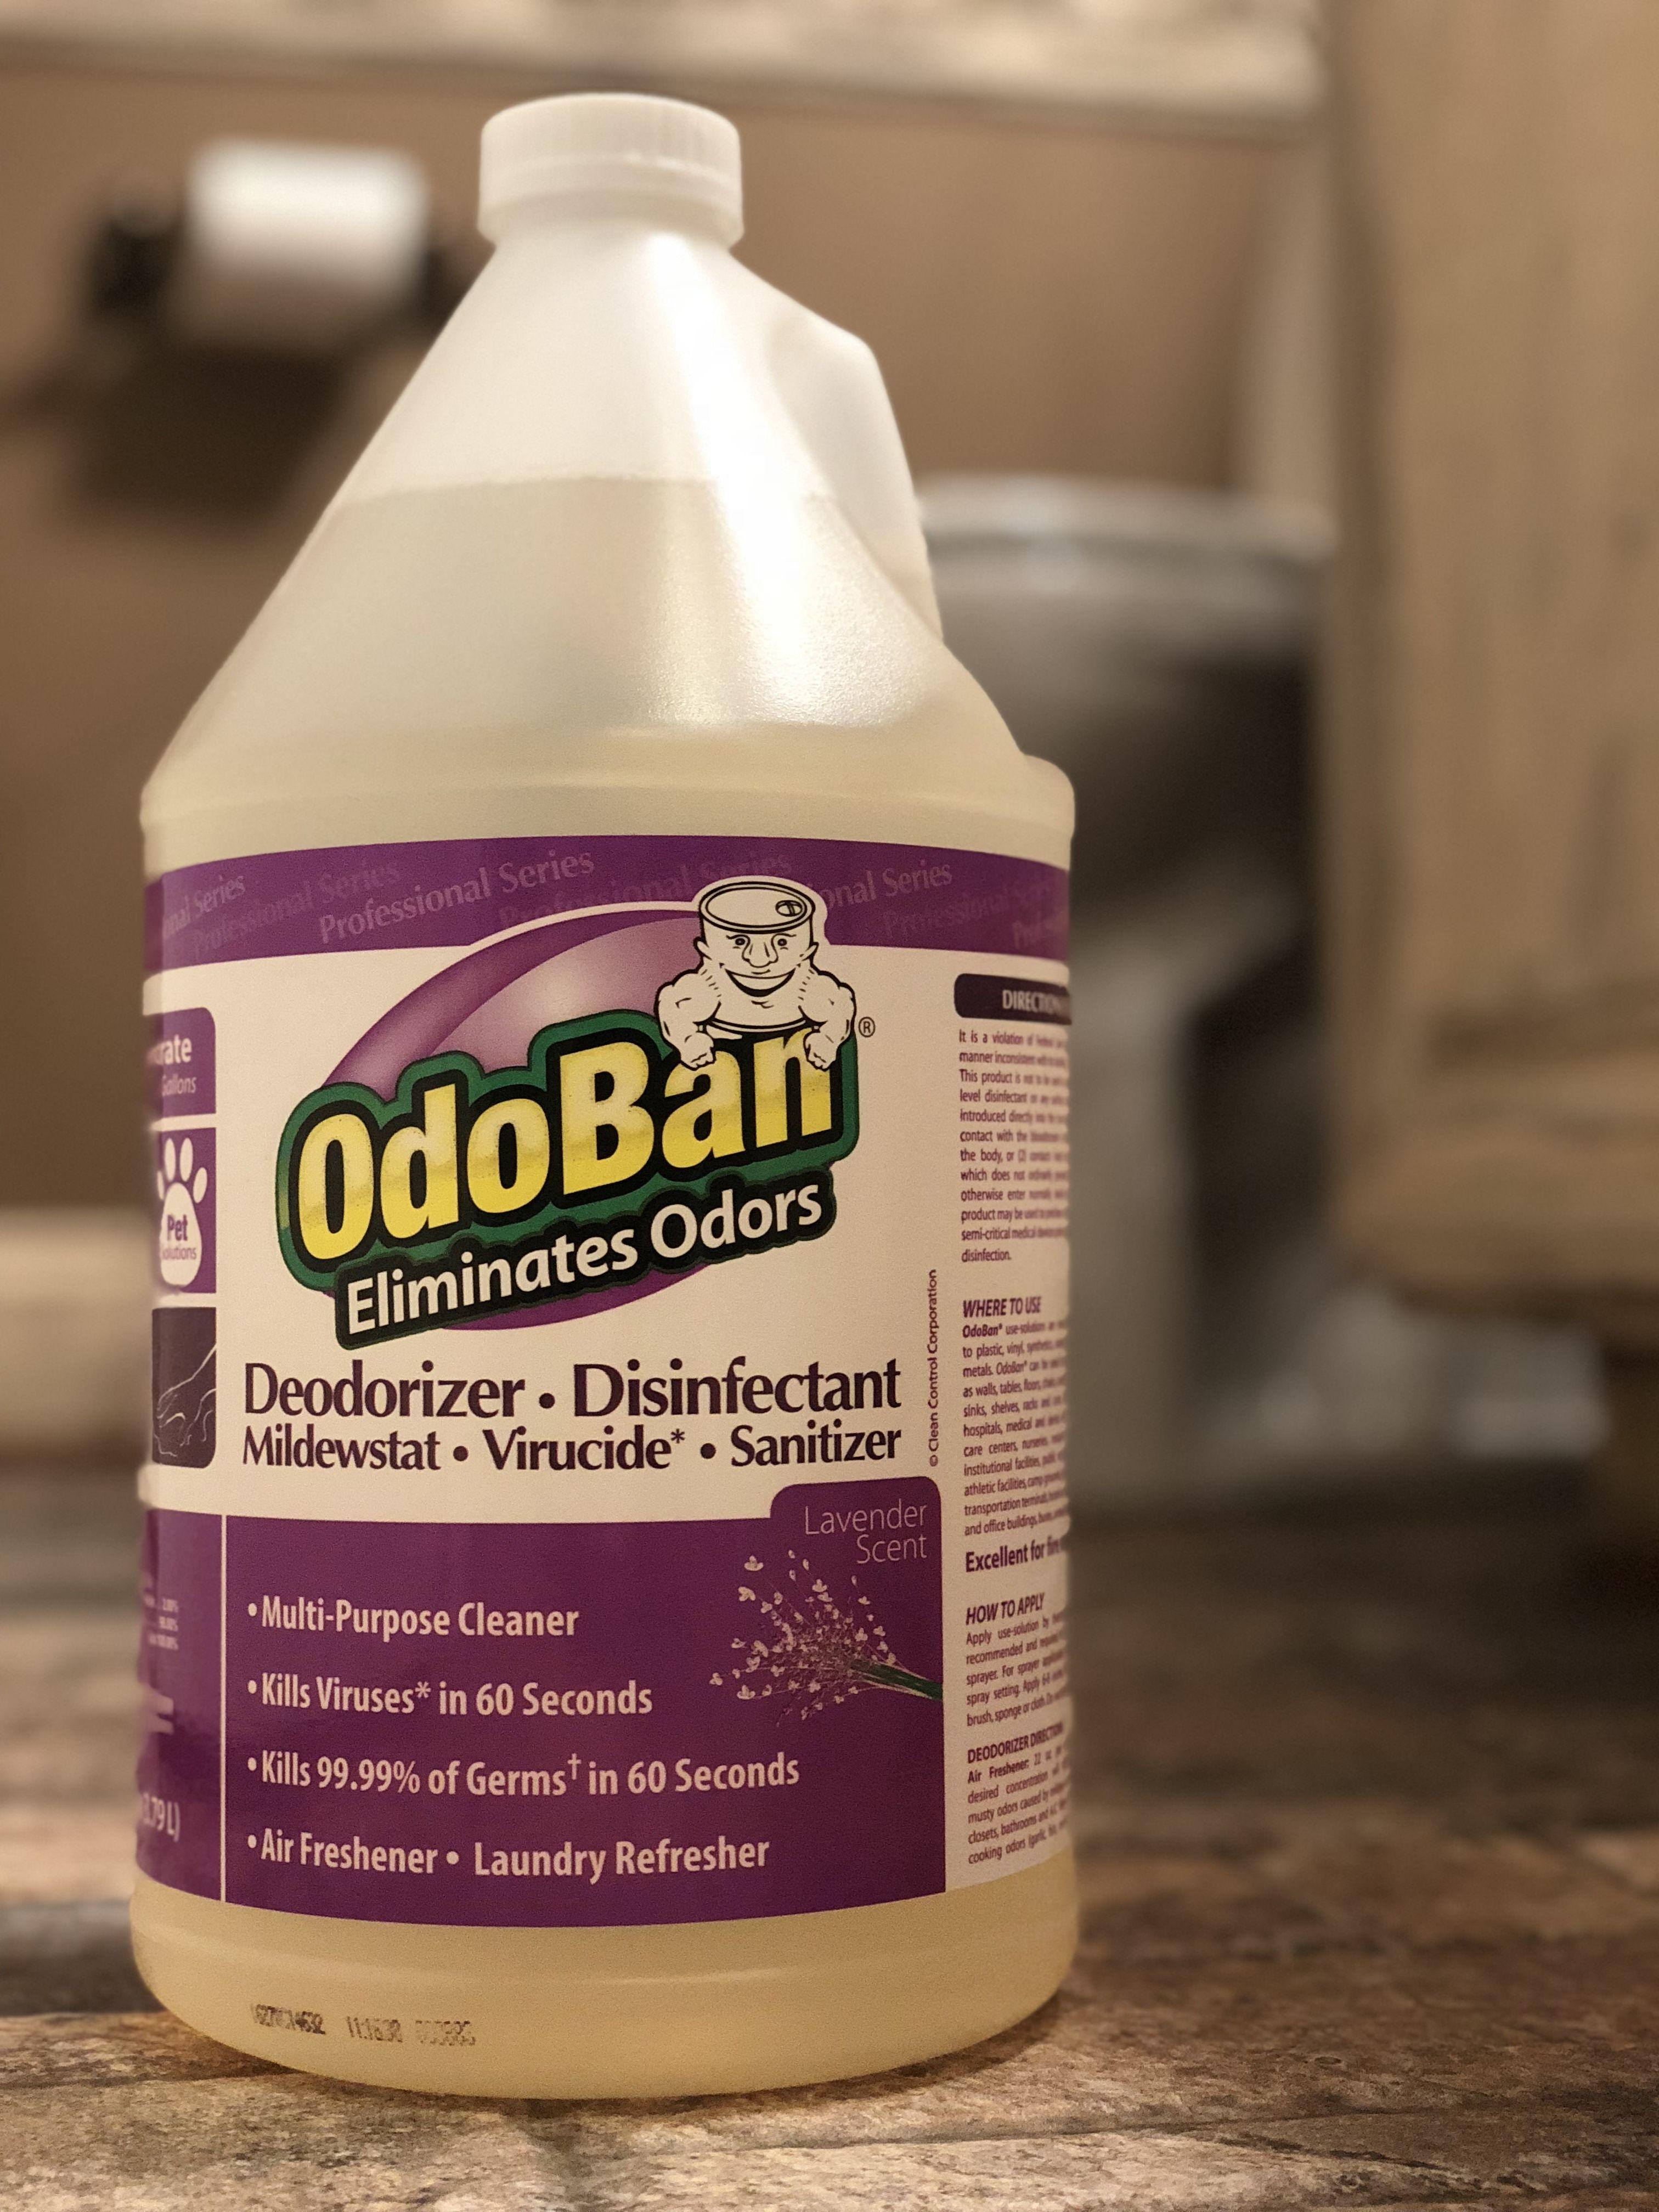 The Best Multi Purpose Cleaner Multipurpose Cleaner Mold And Mildew Odor Eliminator